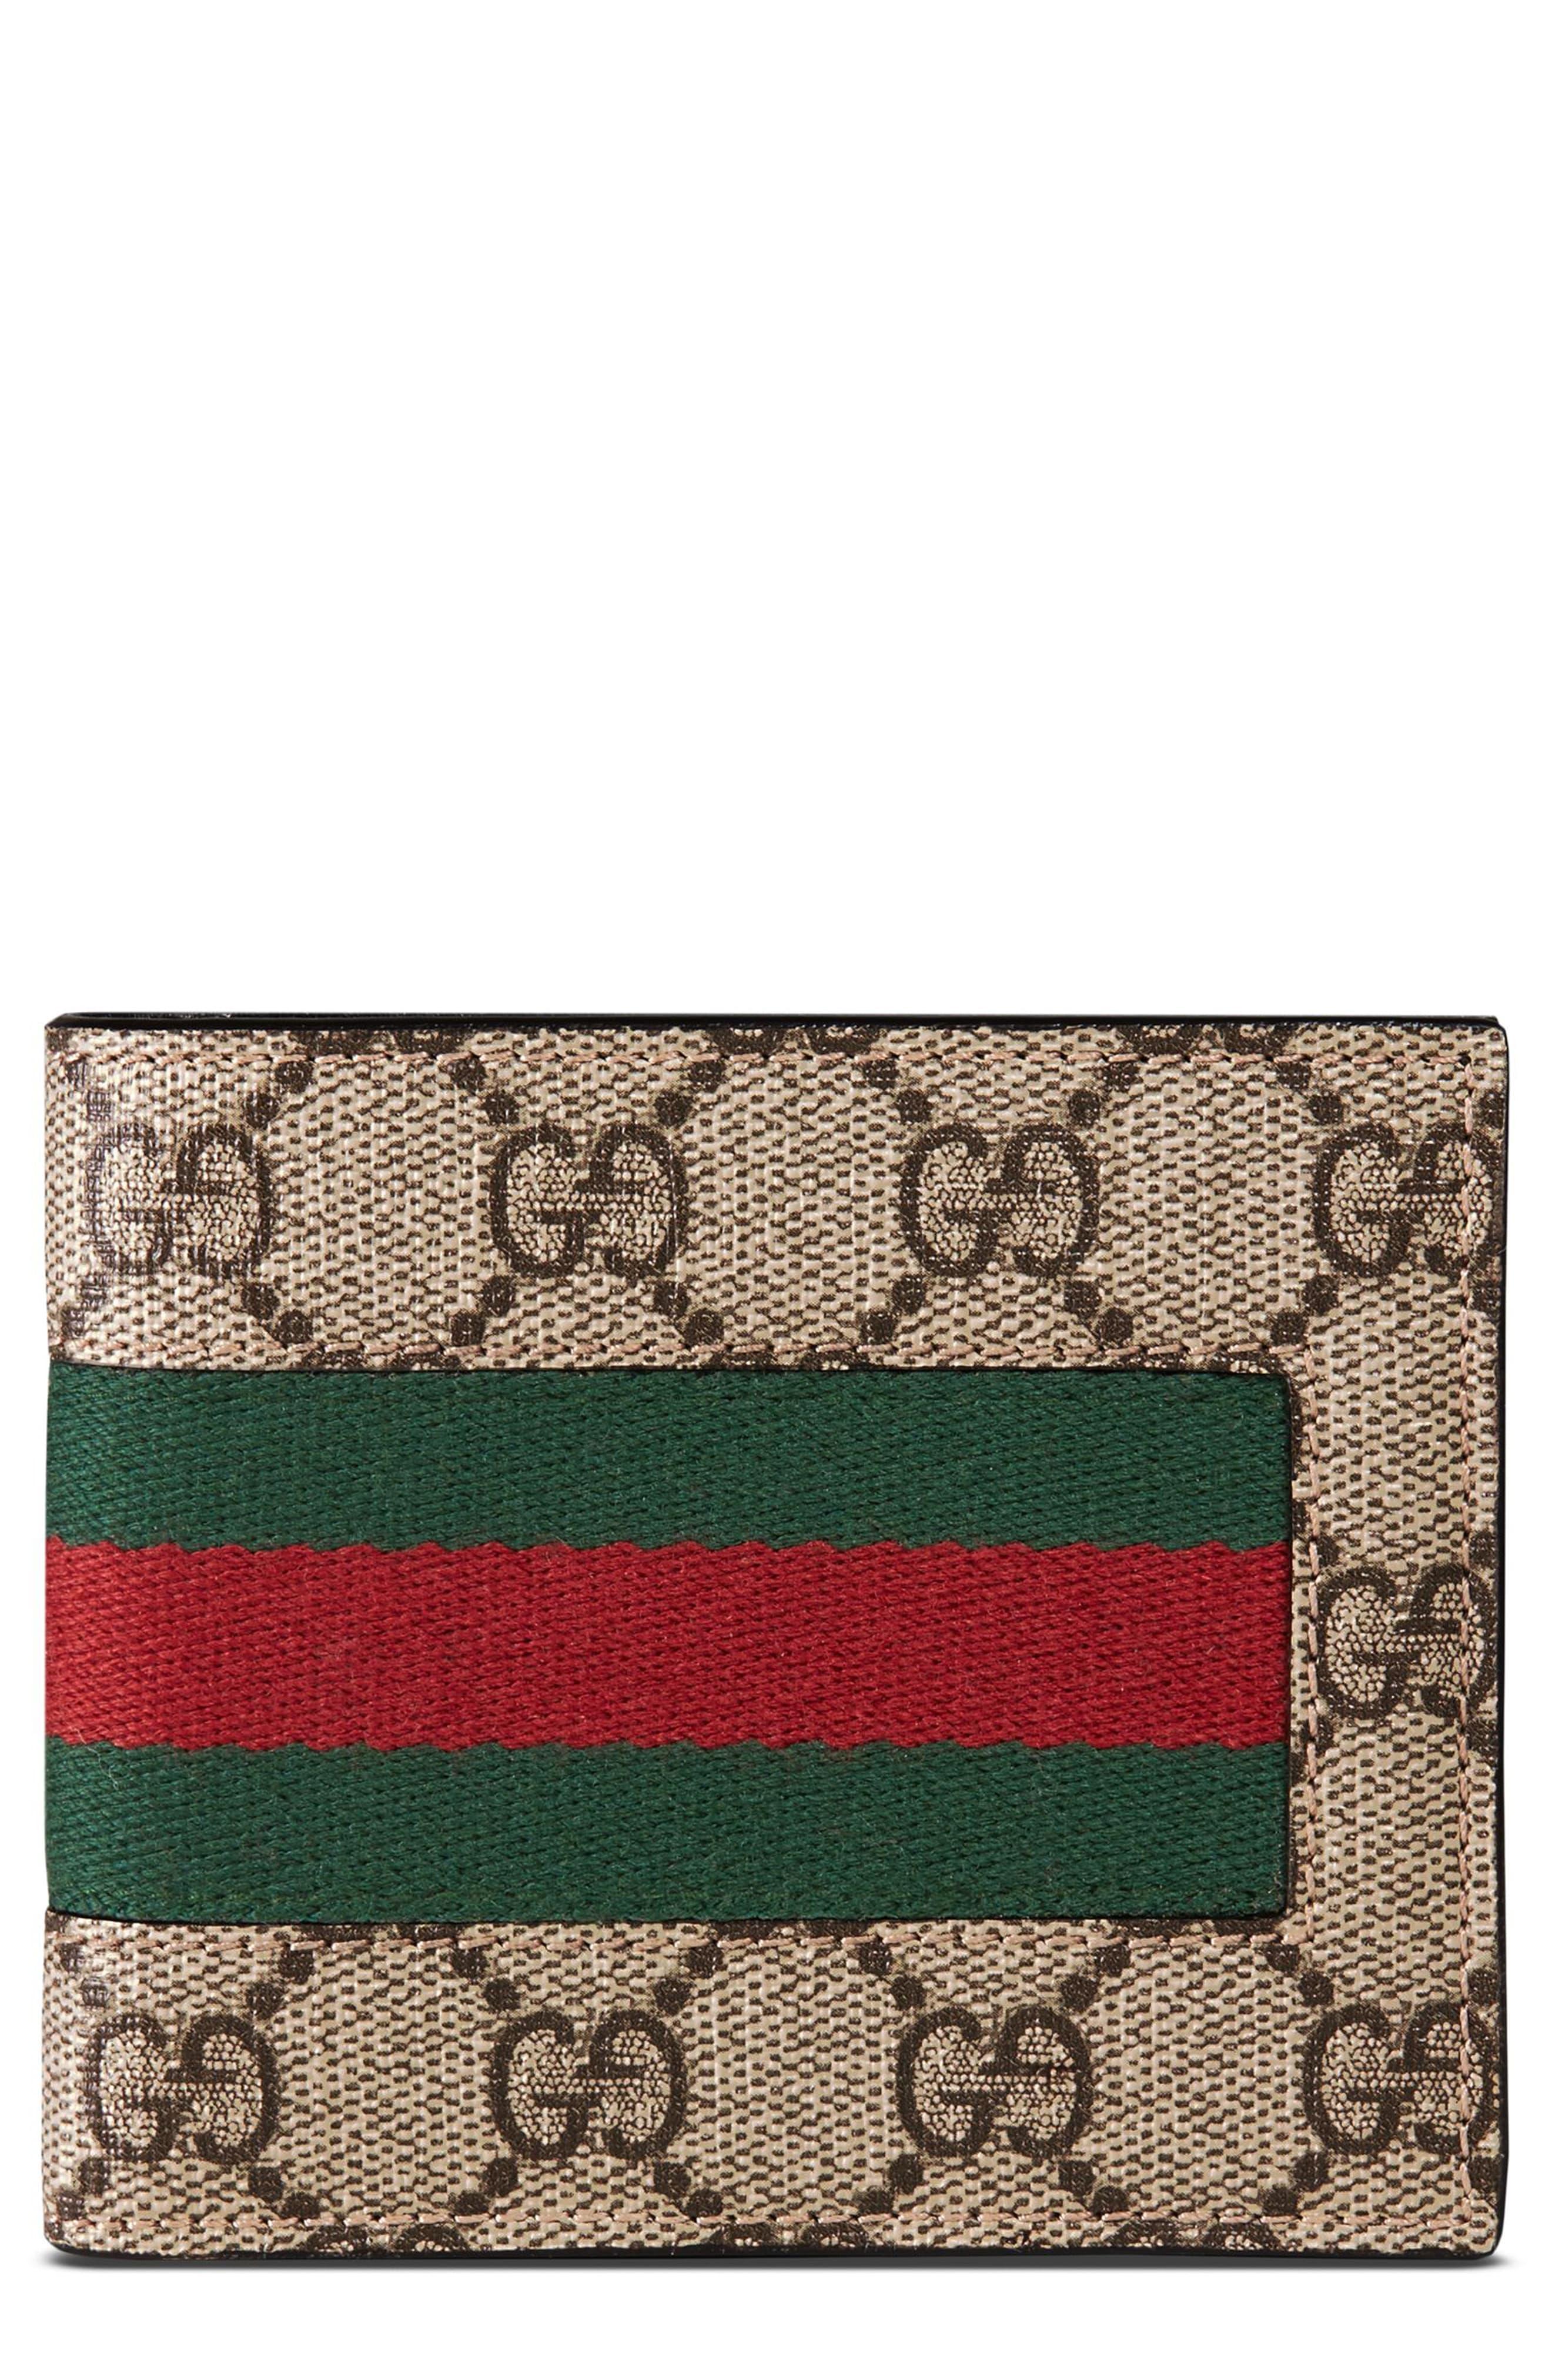 e2455a65e4d3 Gucci Web Gg Supreme Wallet for Men - Save 38% - Lyst